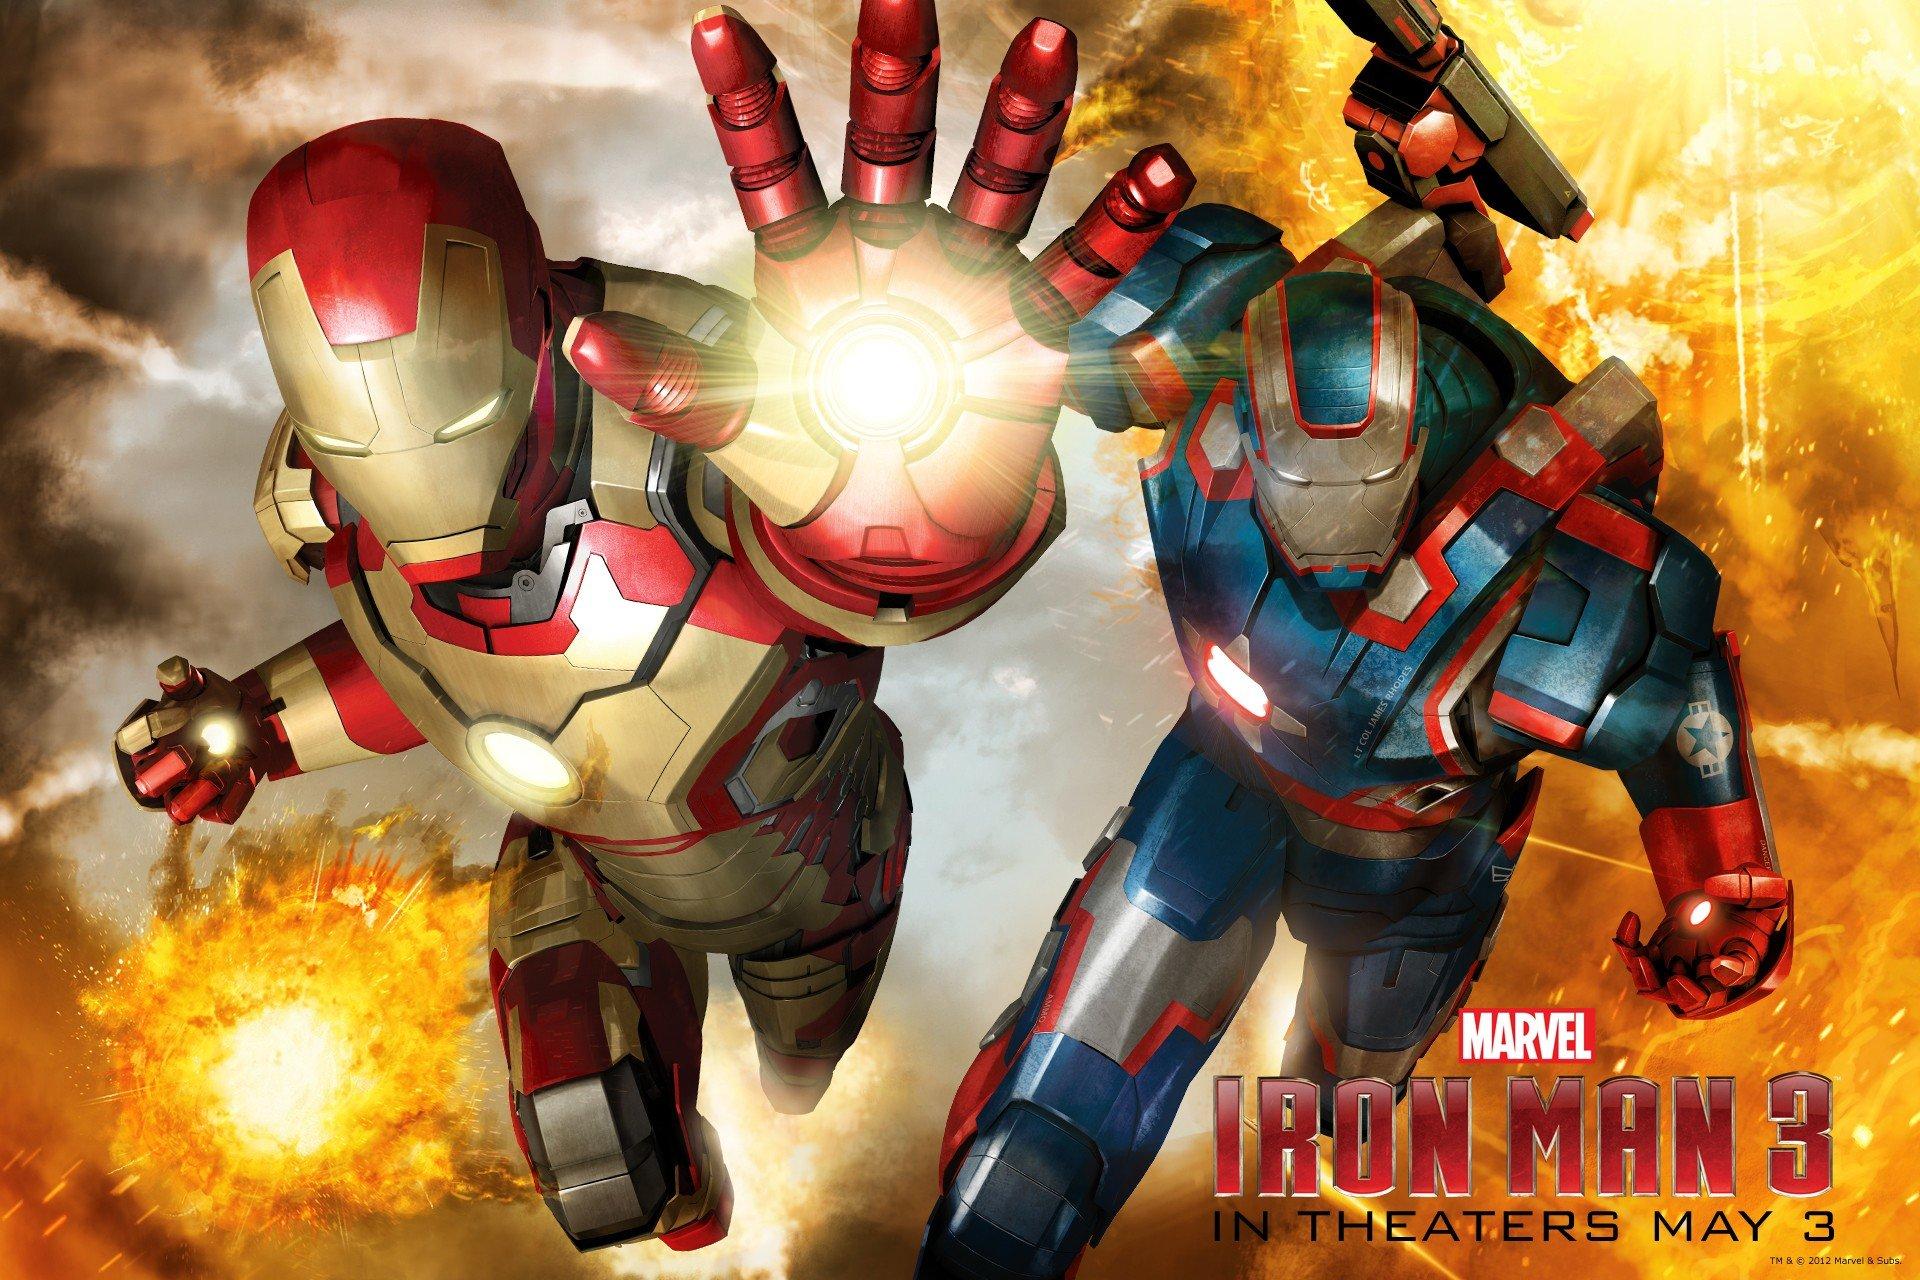 high resolution iron man 3 hd 1920x1280 background id:400977 for desktop